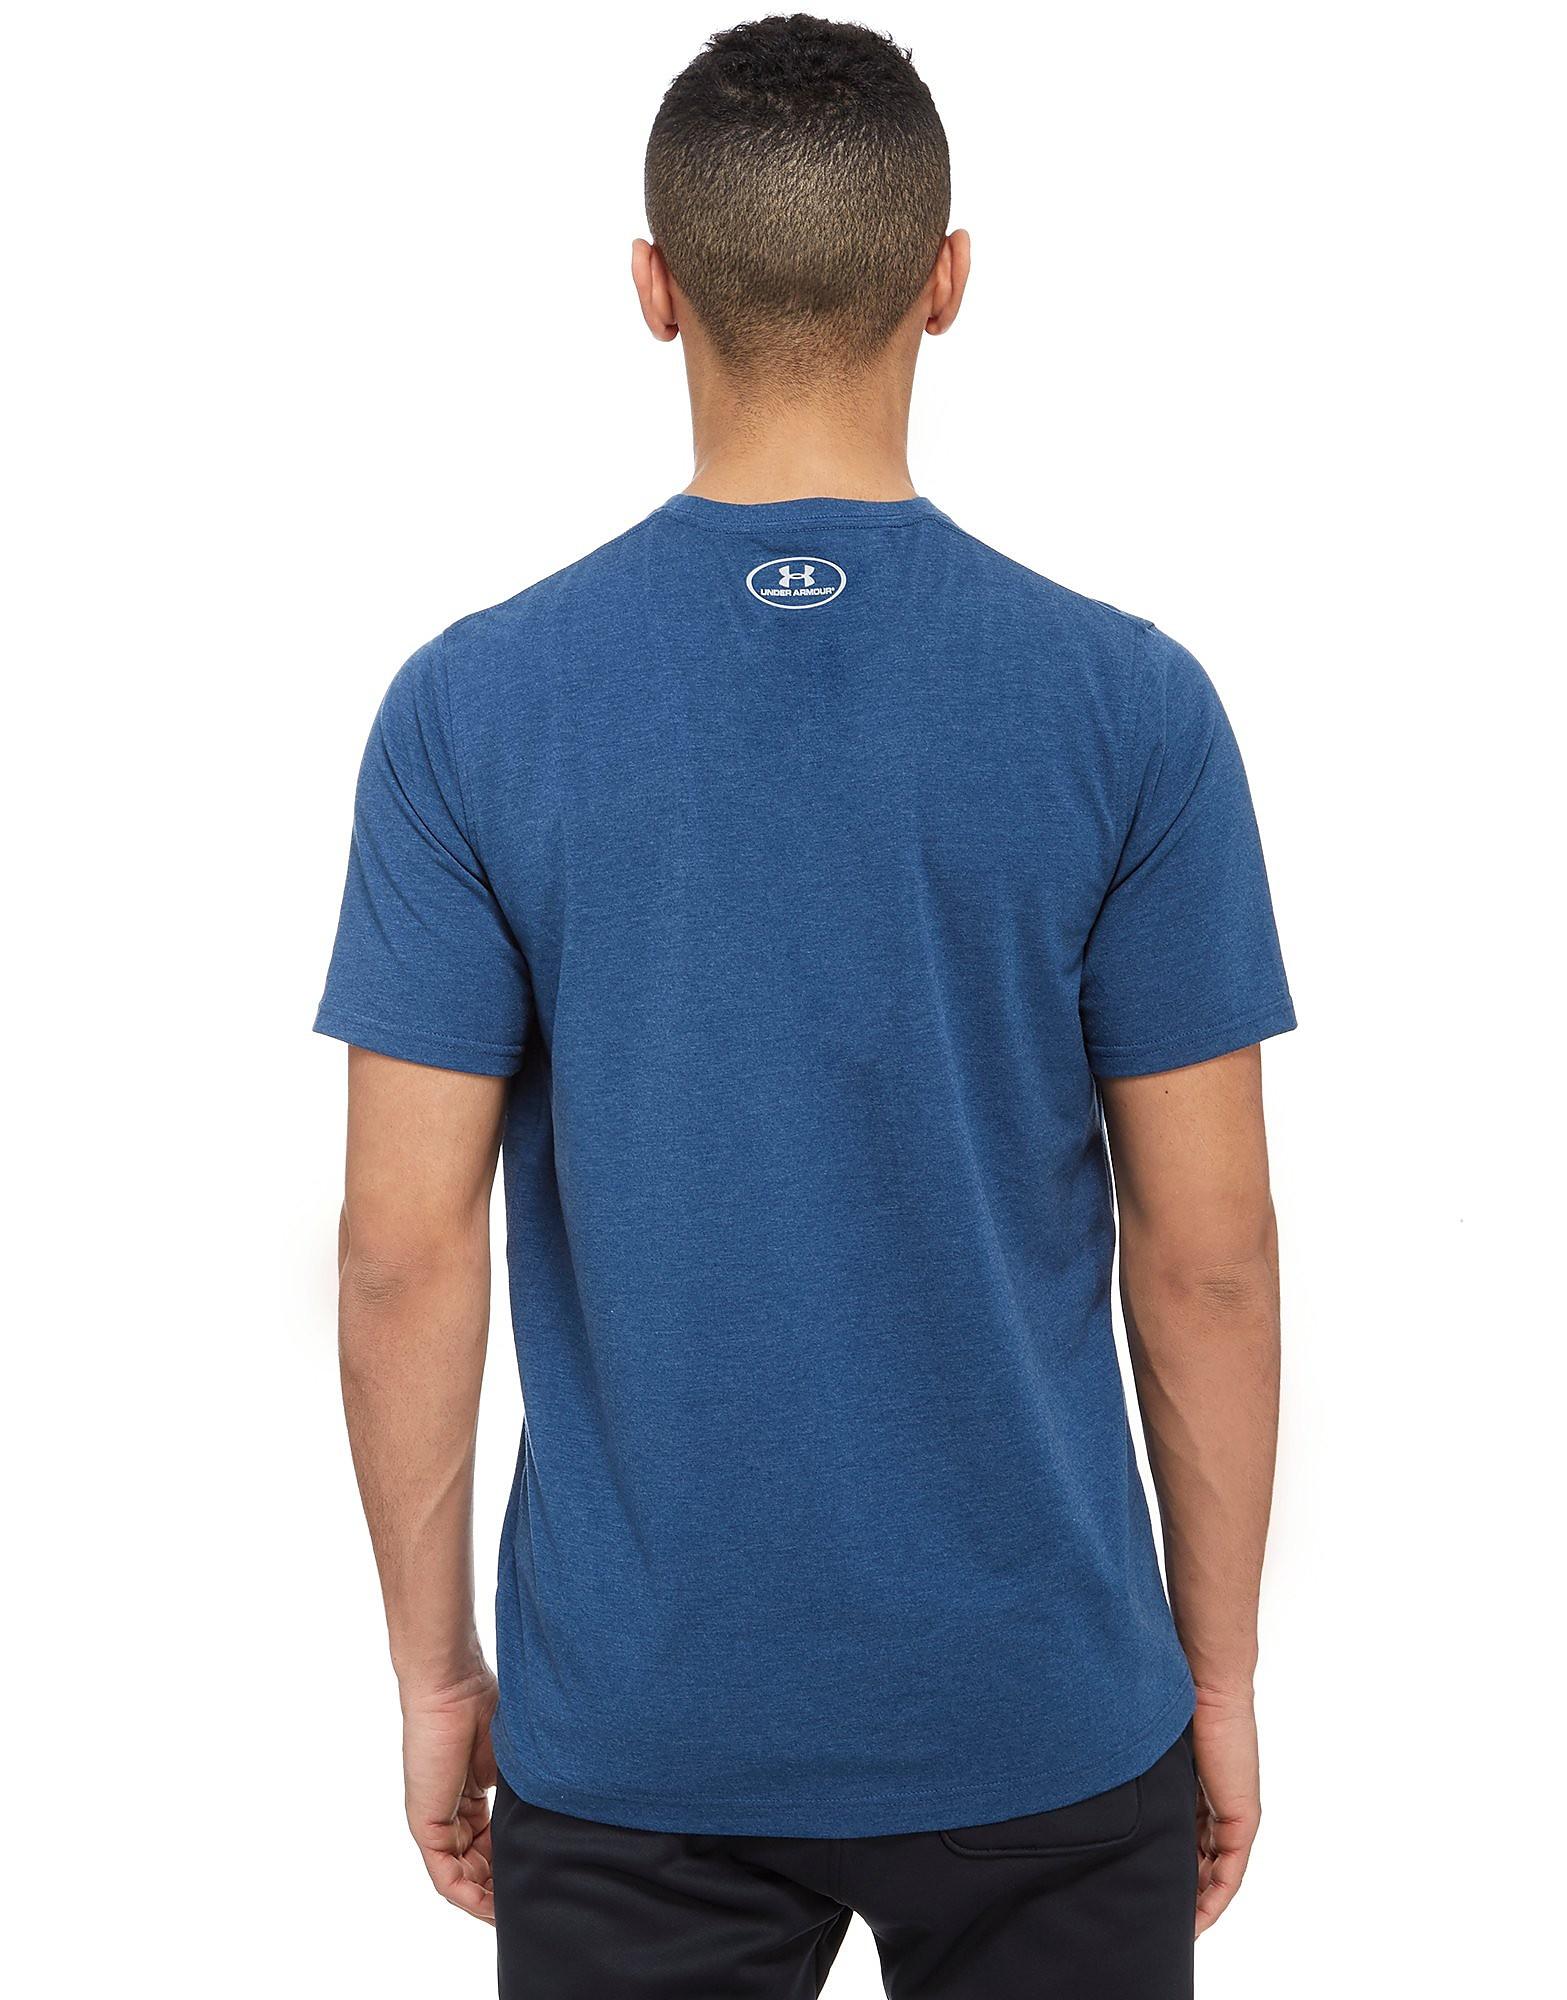 Under Armour Overspray Logo T-Shirt